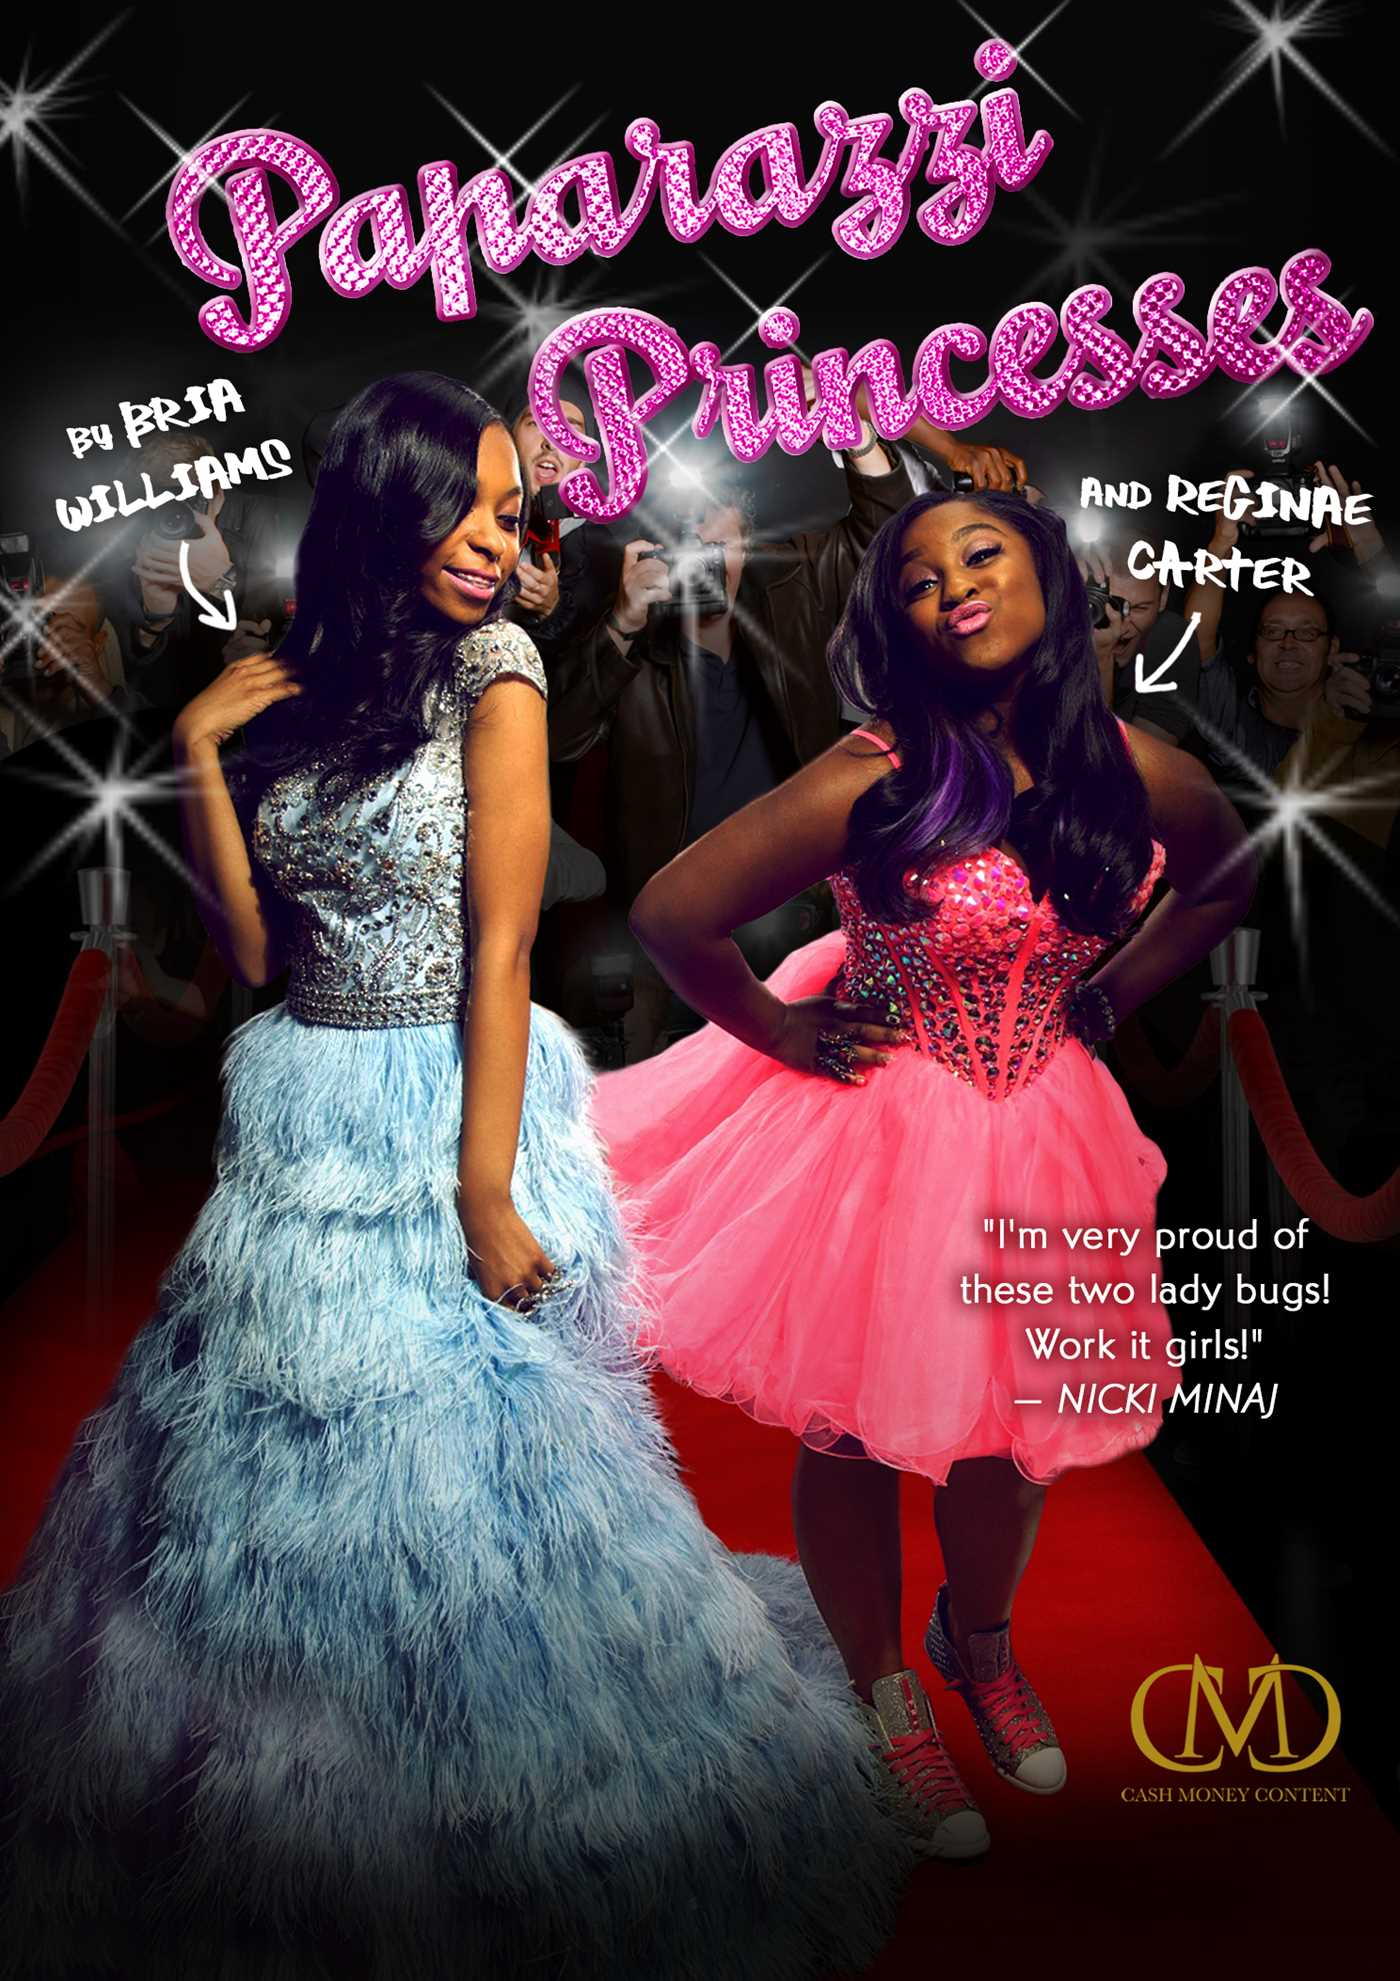 Paparazzi princesses 9781936399369 hr